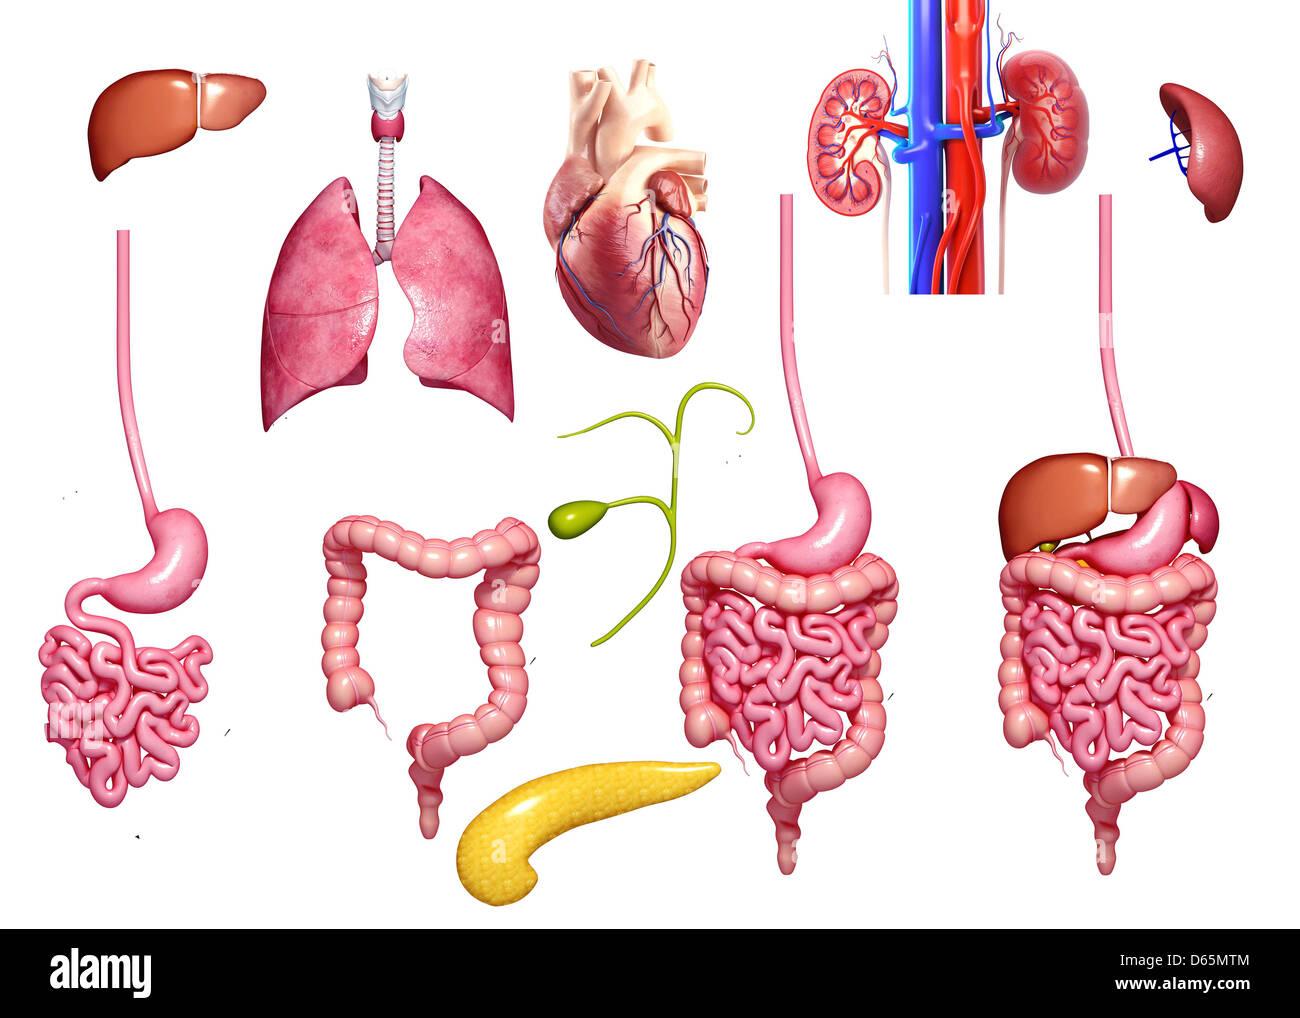 Human organs, artwork - Stock Image